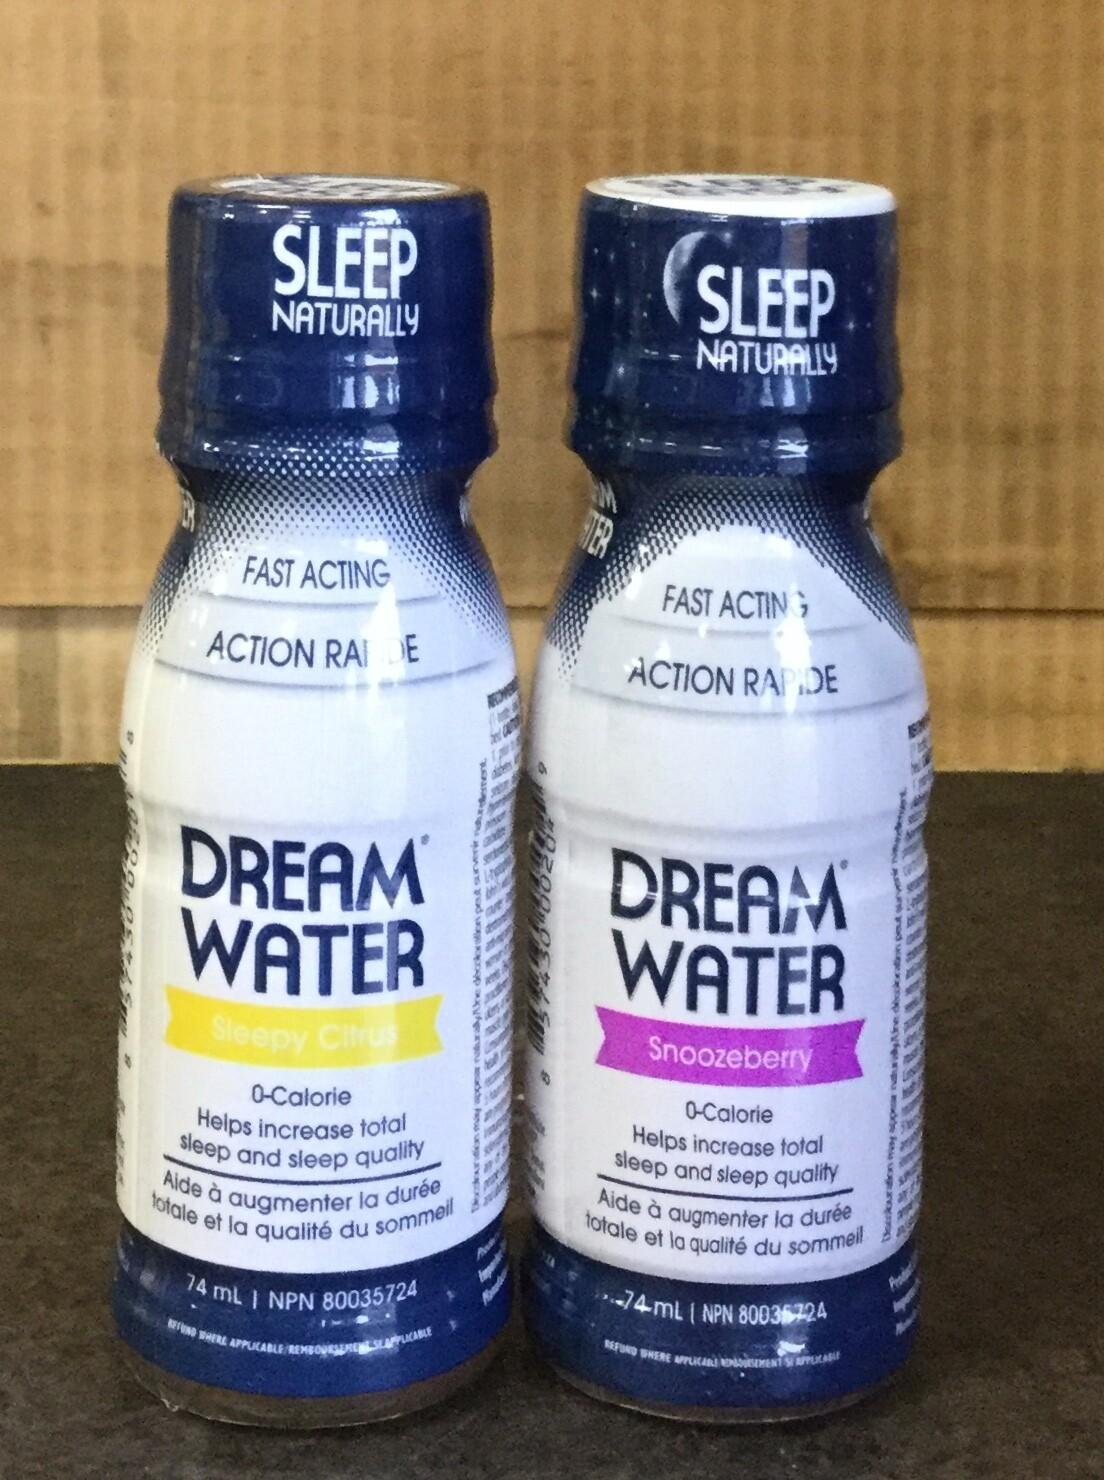 DREAM WATER Snoozeberry 74mL